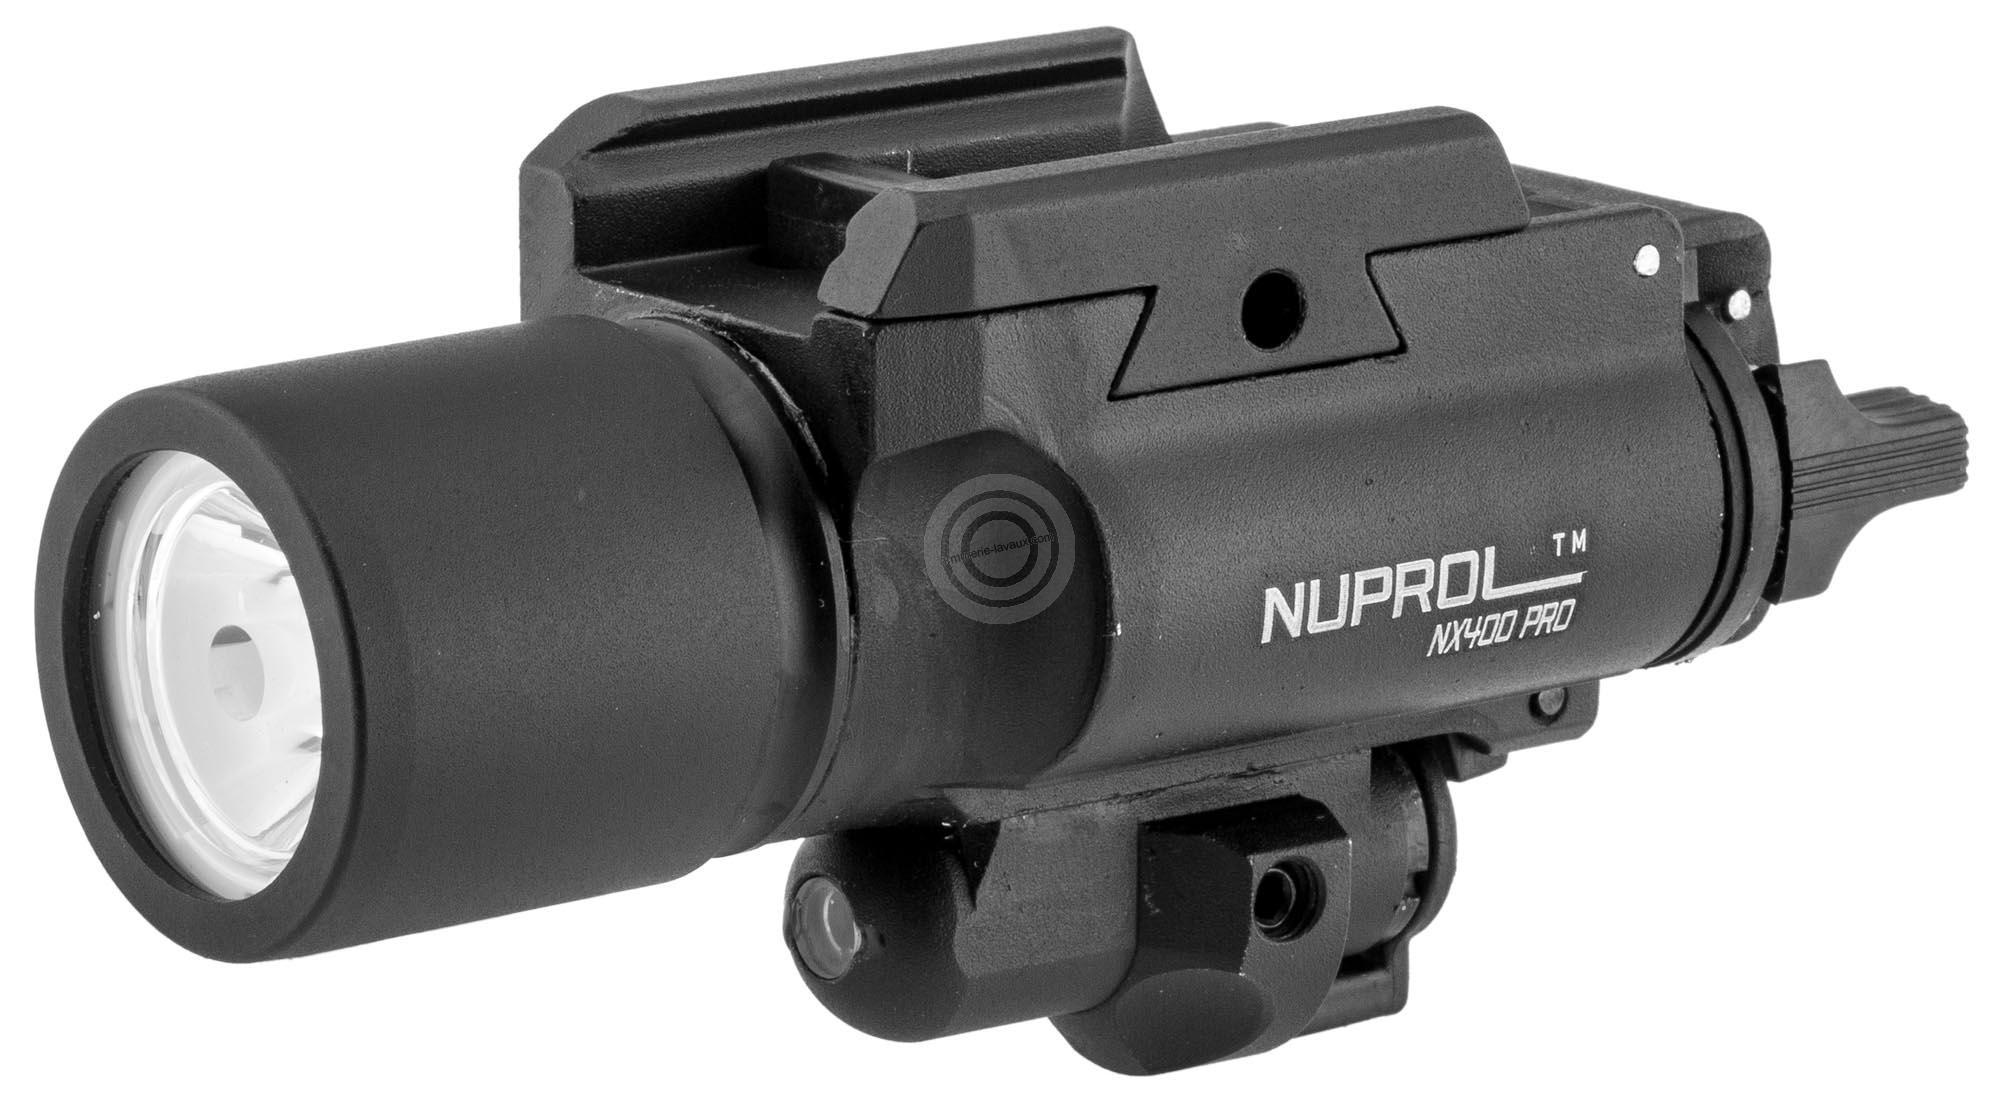 Lampe laser tactique NUPROL NX400 Pro